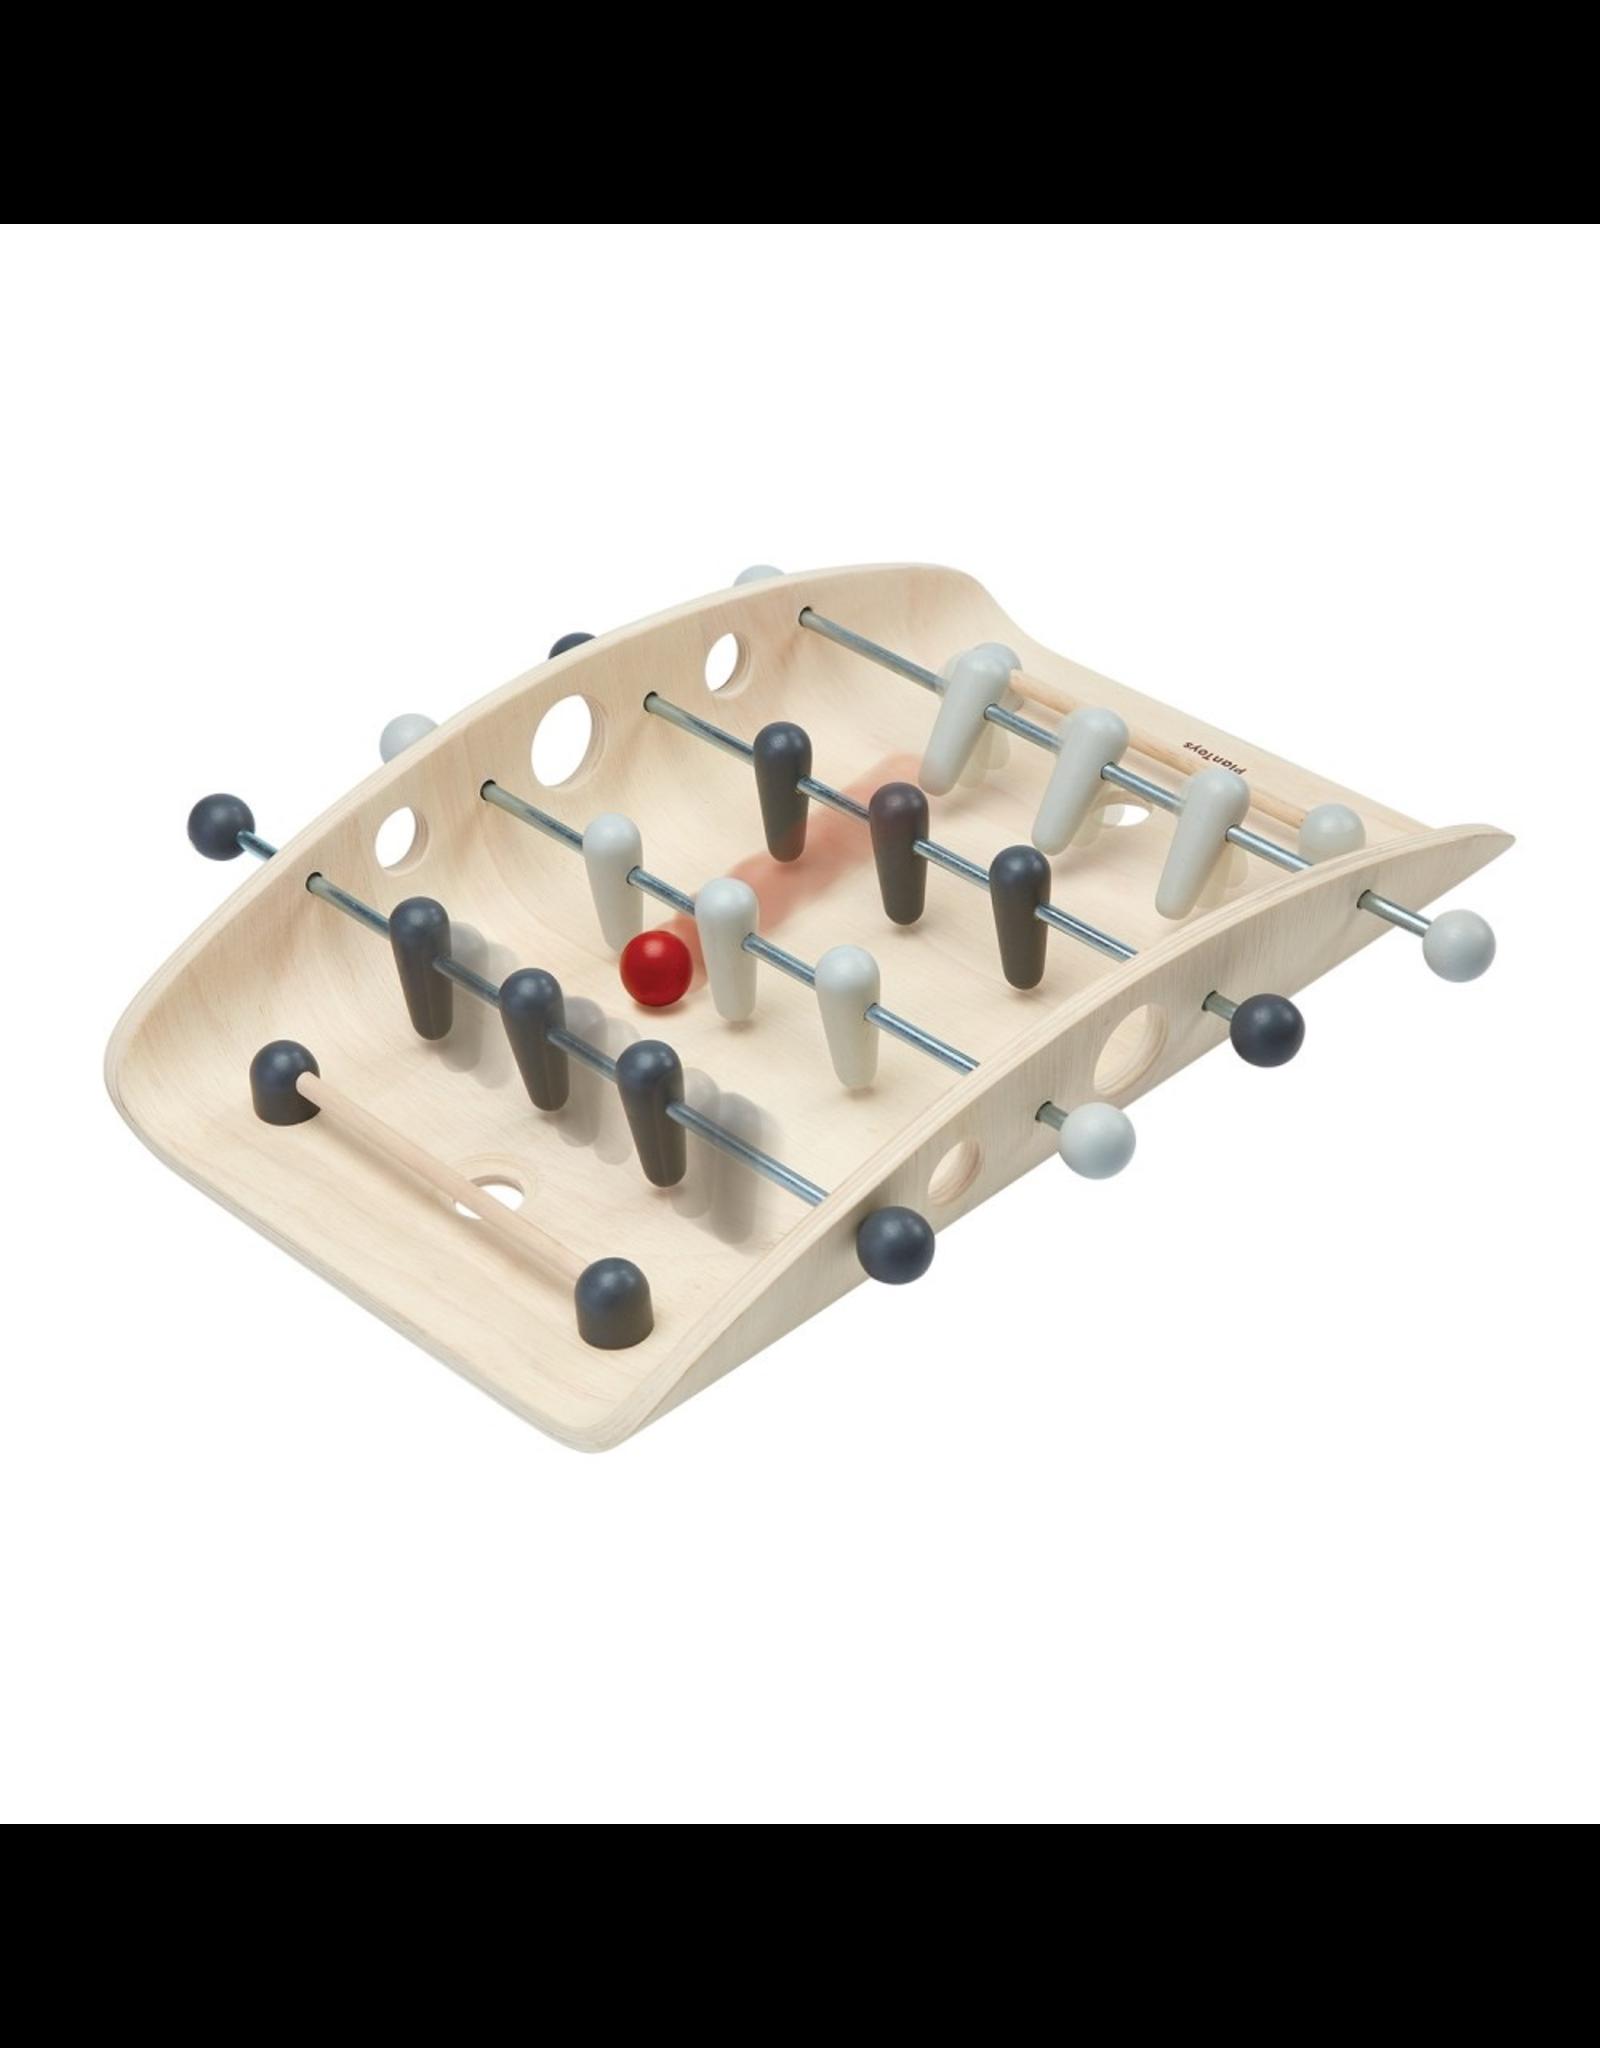 Plan Toys Soccer By Plan Toys